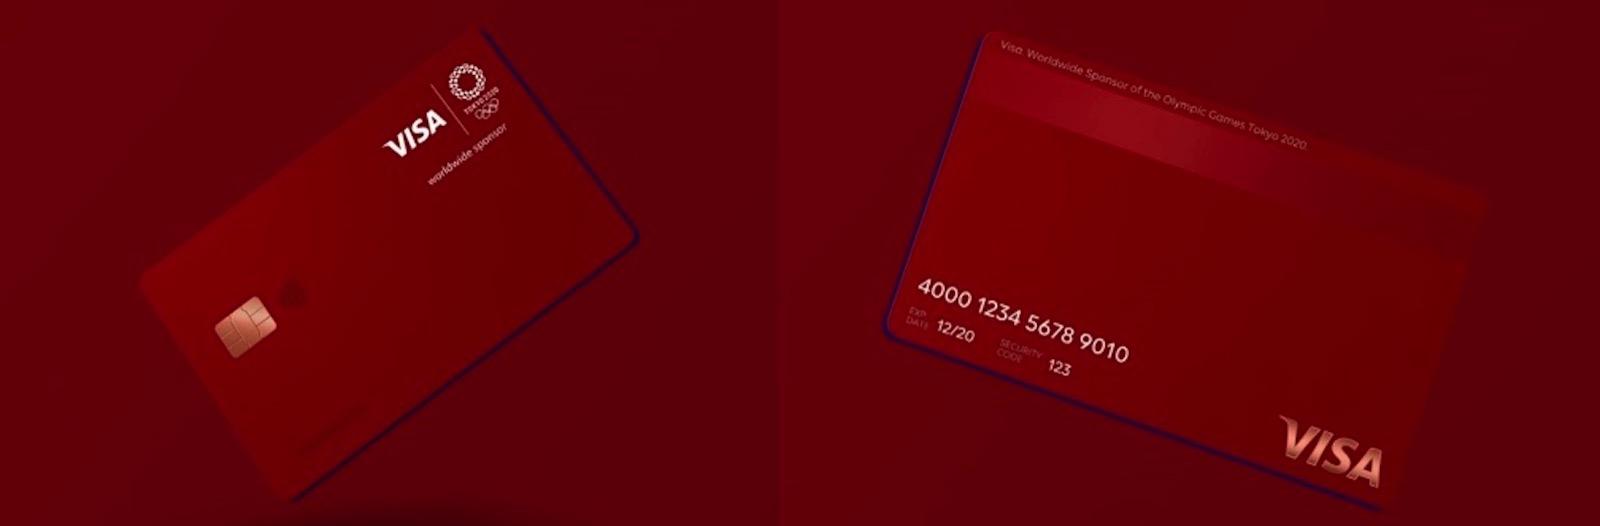 LINE-Pay-Visa-Credit-Card.jpg